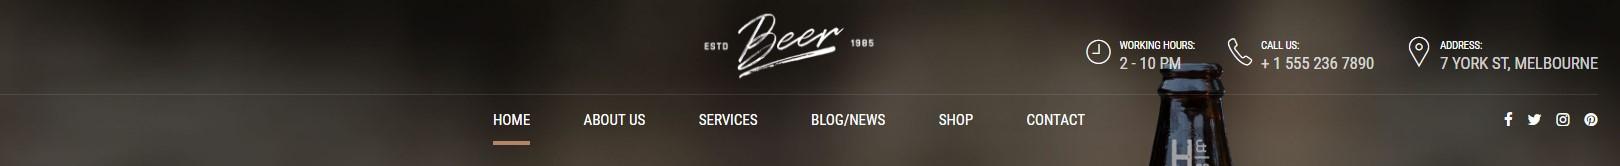 https://documentation.bold-themes.com/craft-beer/wp-content/uploads/sites/17/2017/06/menu-below-center.jpg